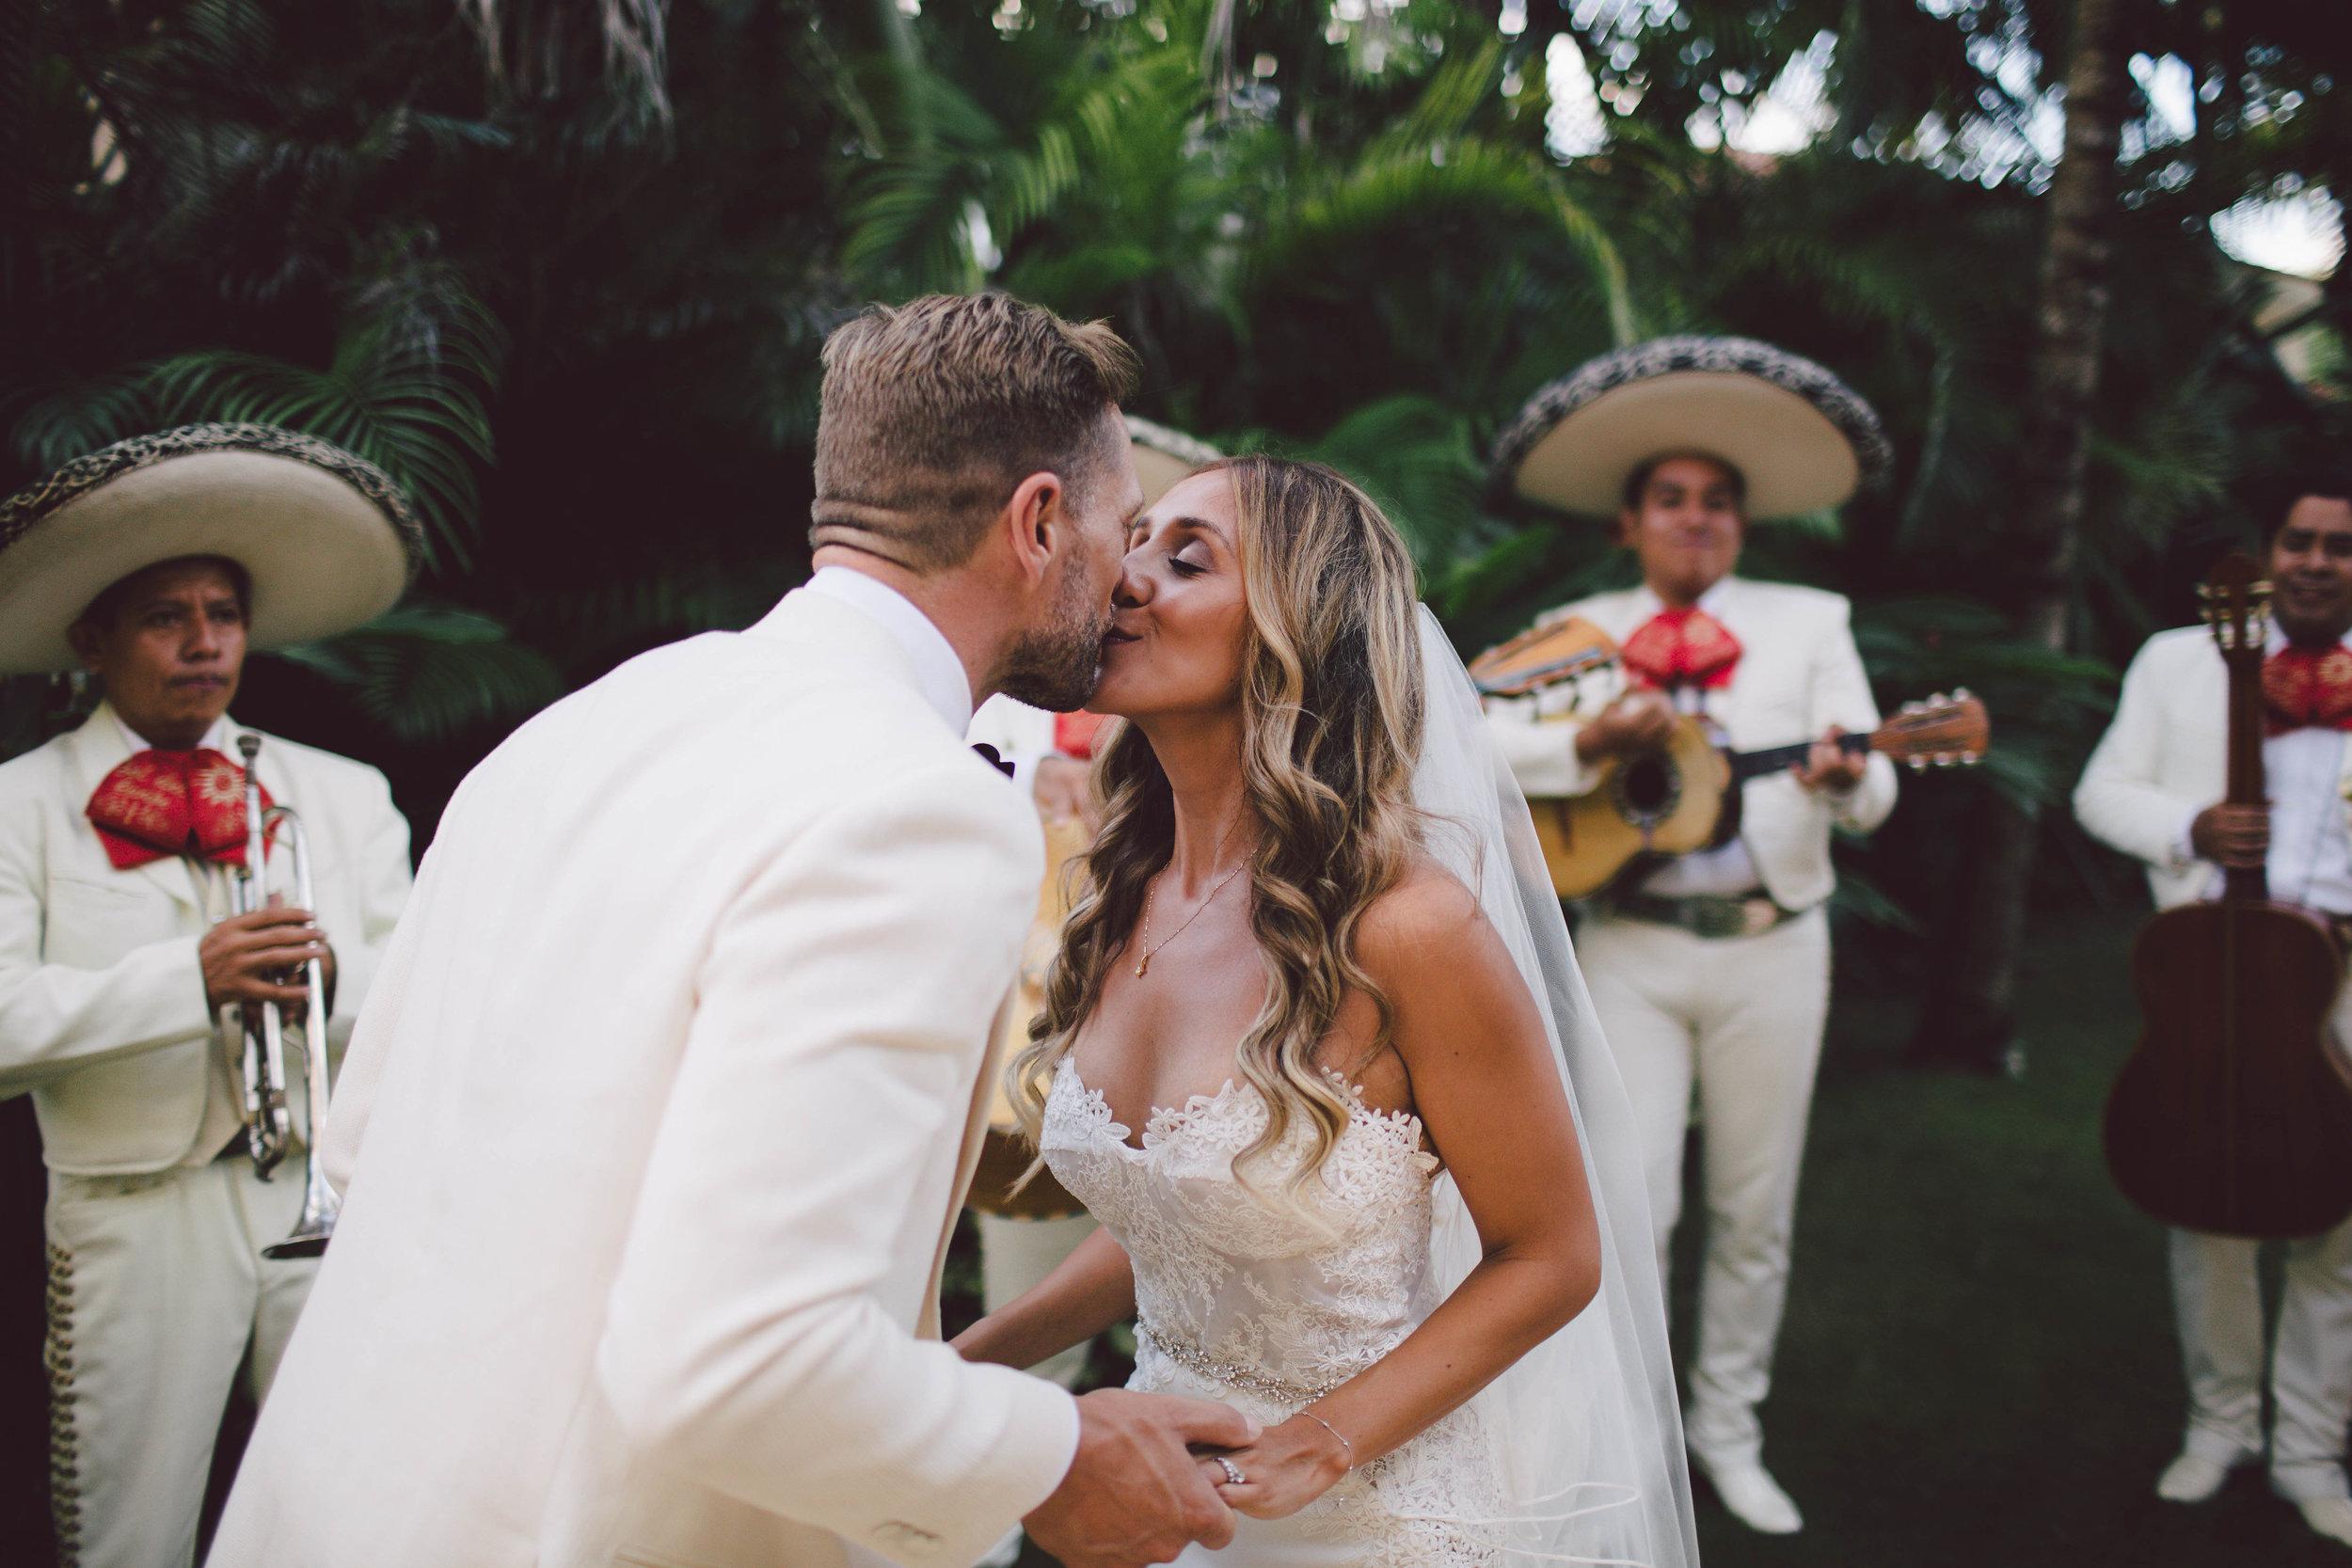 mexico_wedding_cancun_villa_la_joya_evangeline_lane_102.jpg